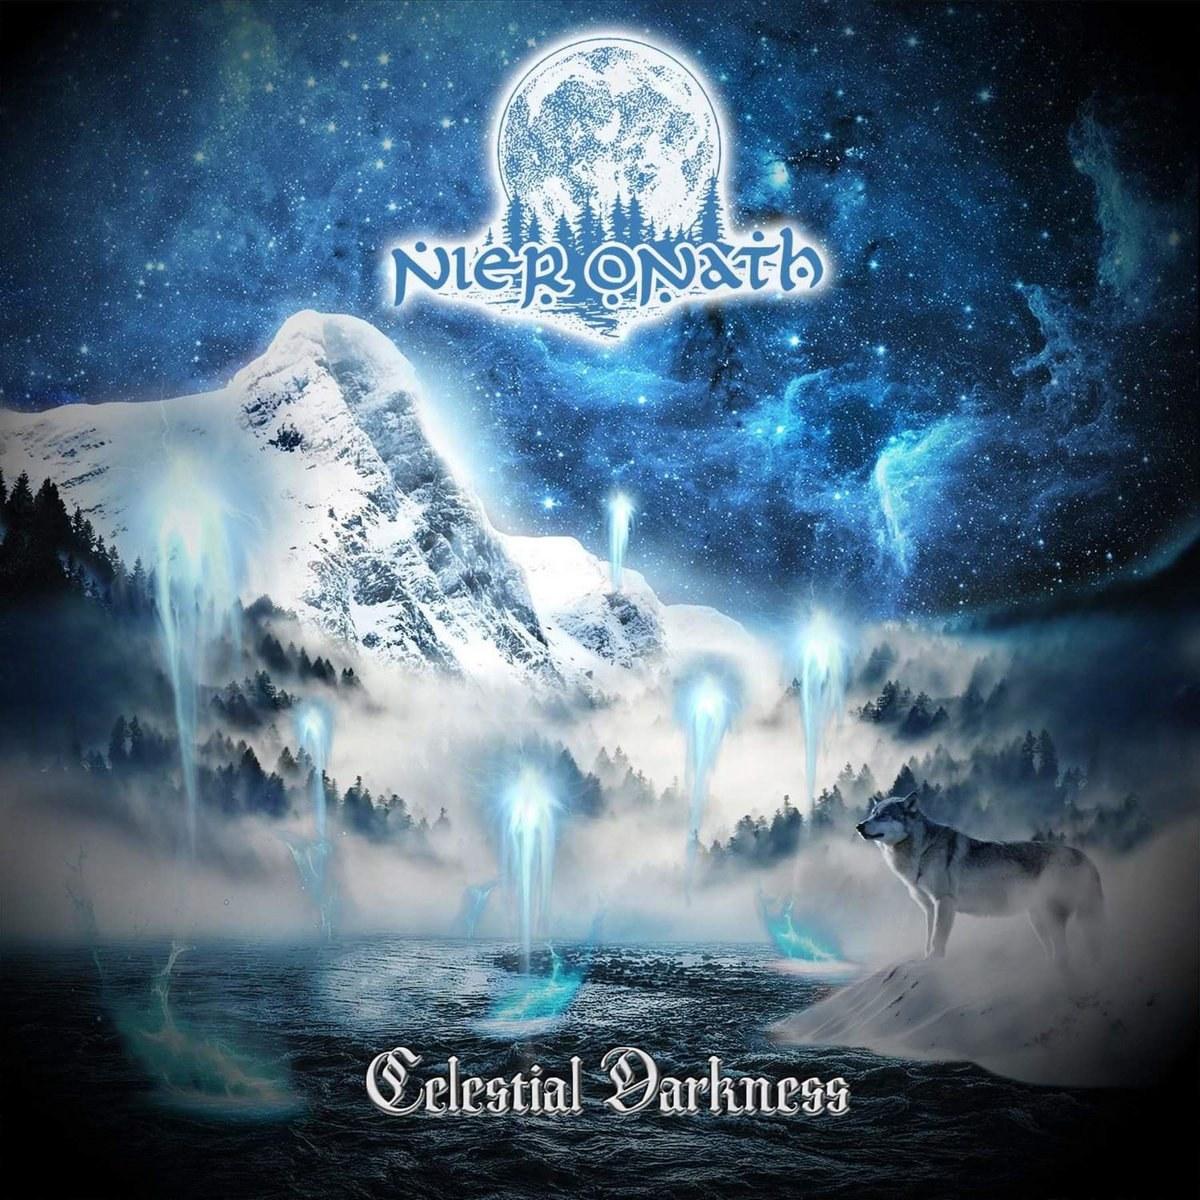 Reviews for Nier Onath - Celestial Darkness